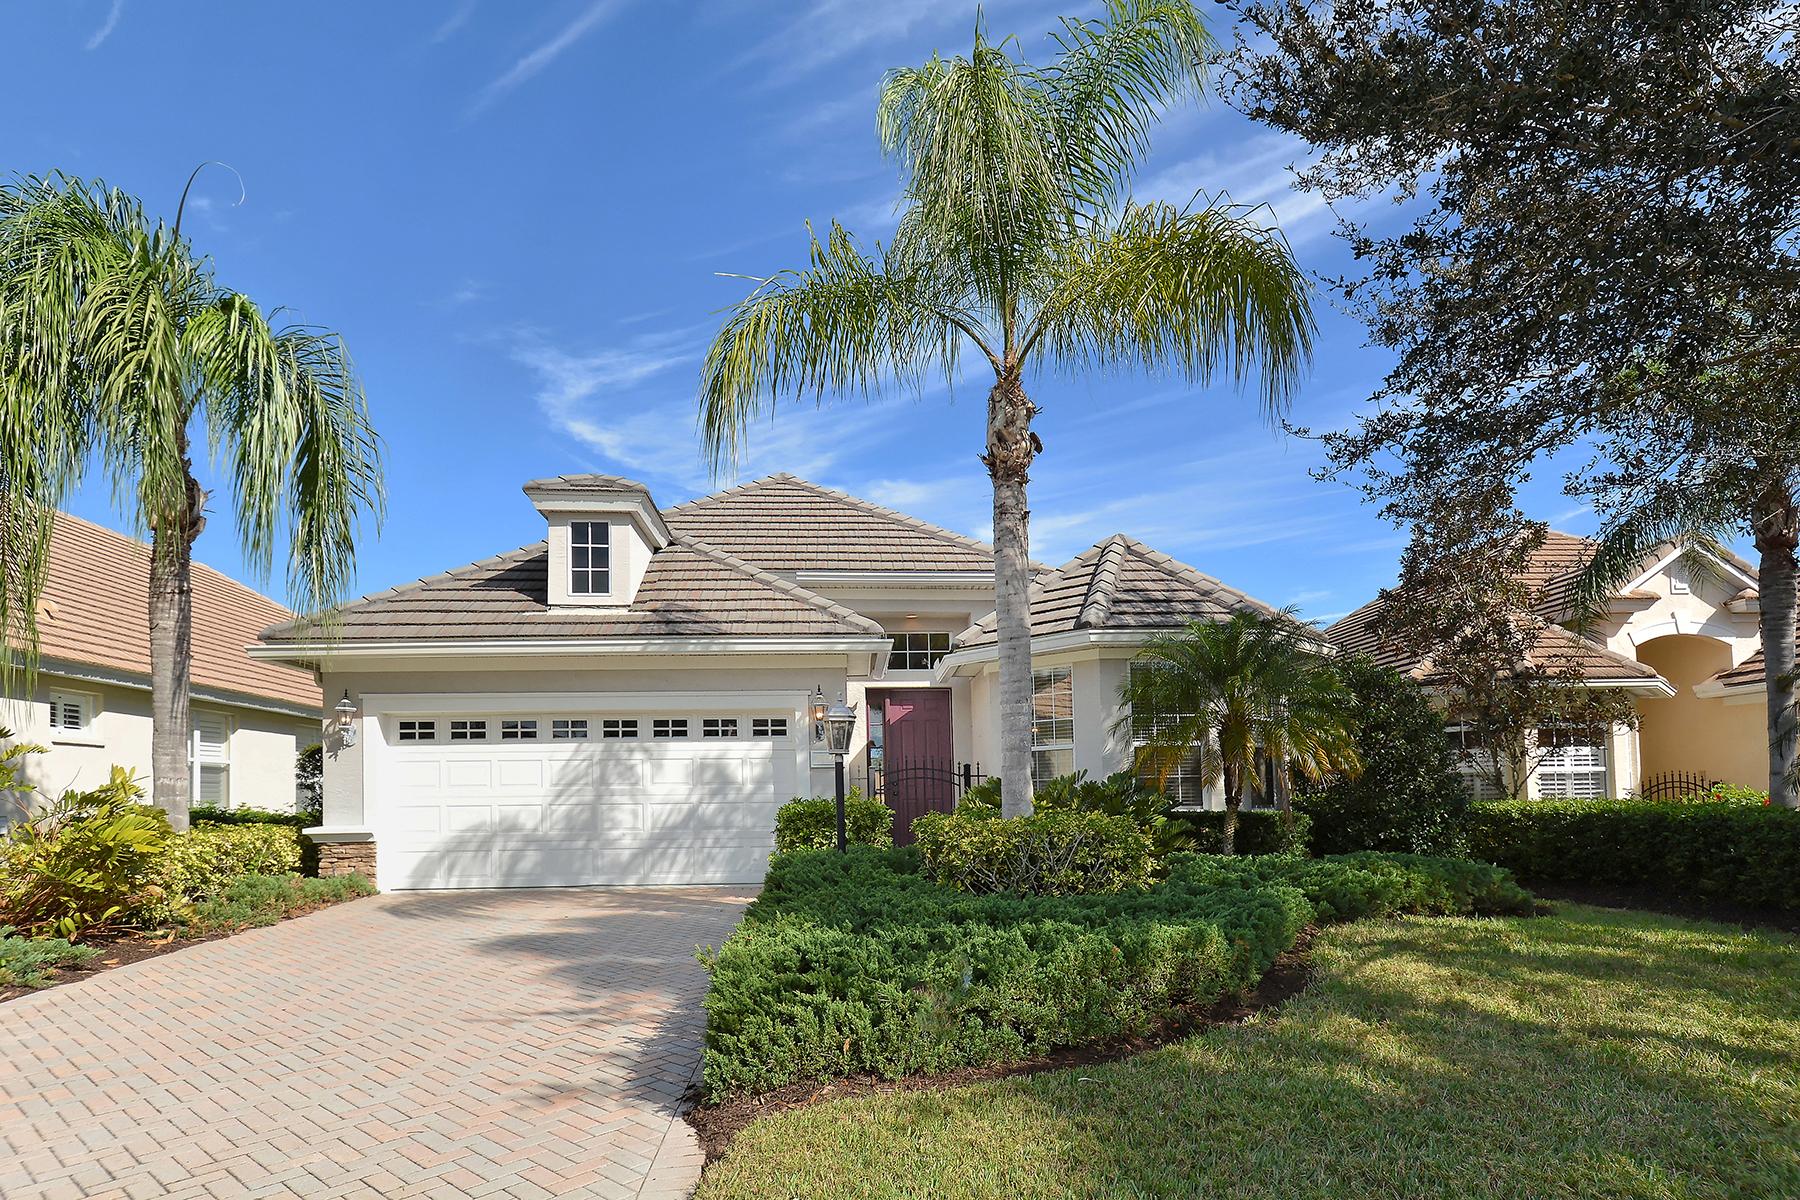 Villa per Vendita alle ore SANDHILLS 7123 Sandhills Pl Lakewood Ranch, Florida, 34202 Stati Uniti